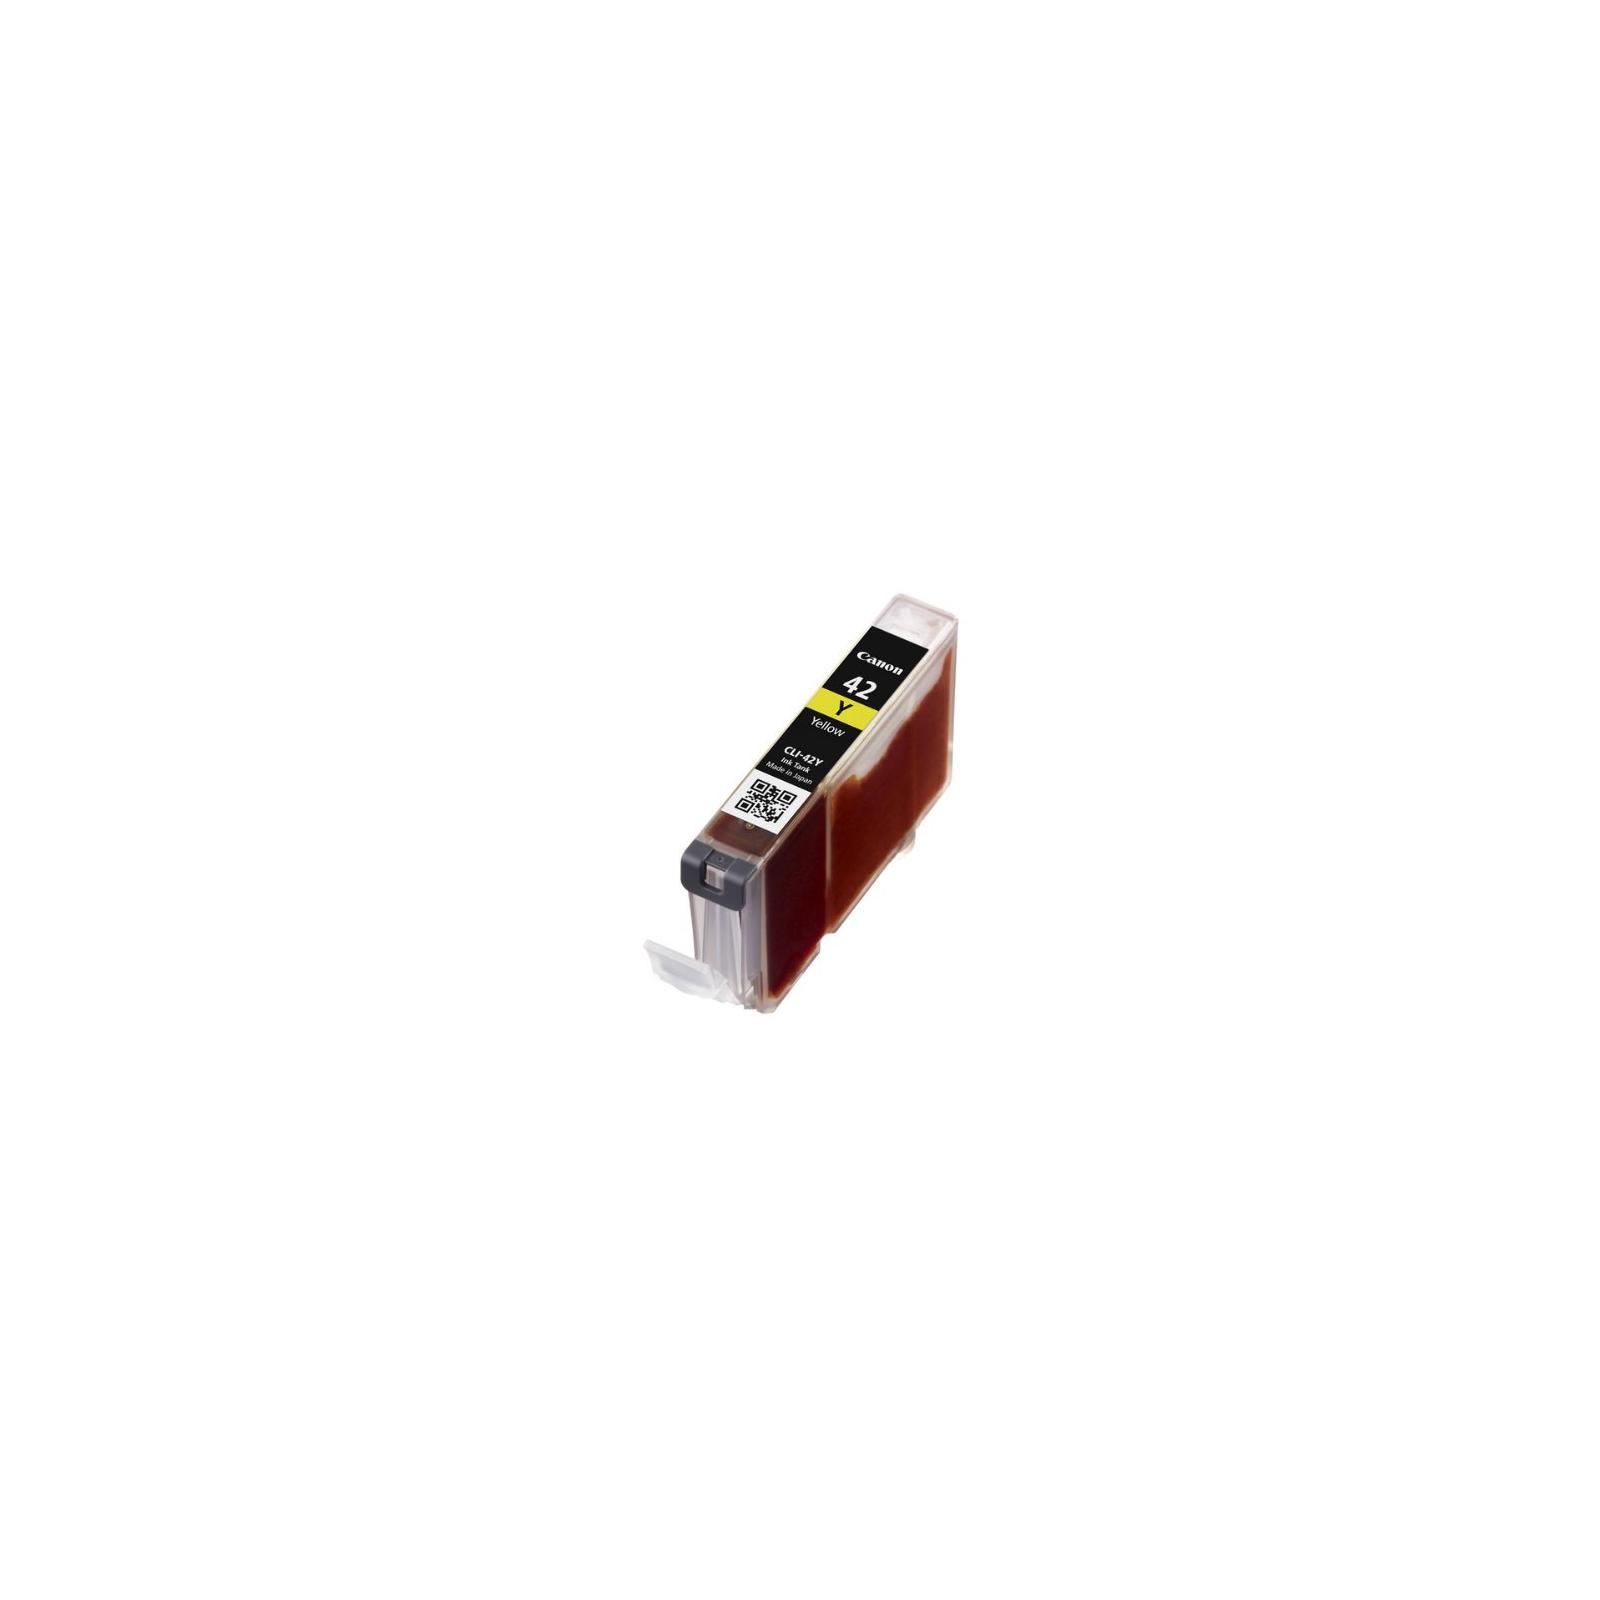 Картридж Canon CLI-42 Yellow для PIXMA PRO-100 (6387B001) изображение 3